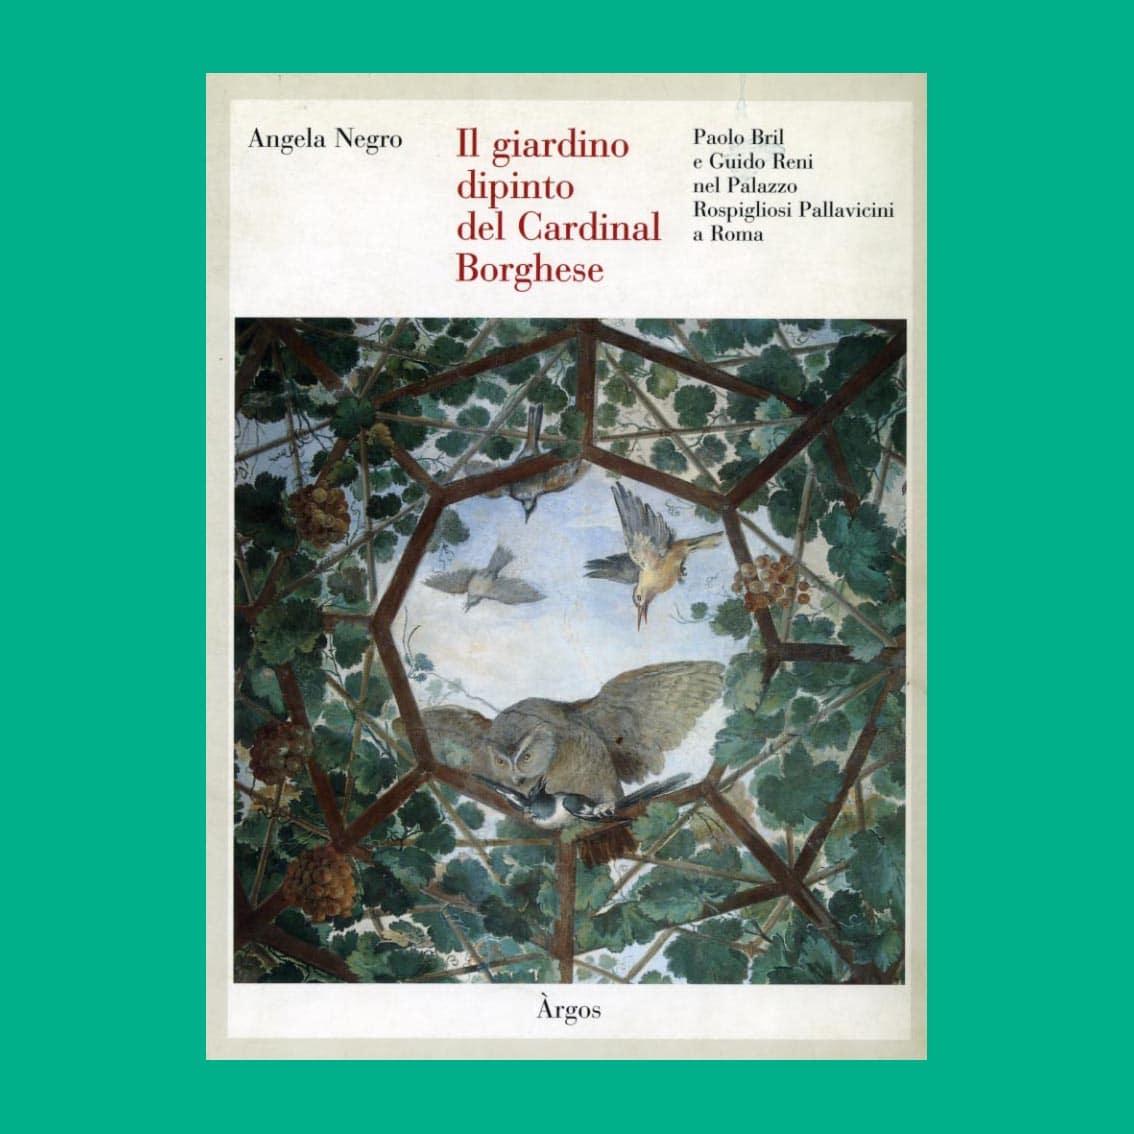 http://cbccoop.it/app/uploads/2017/06/Il-giardino-dipinto-del-Cardinal-Borghese.jpg